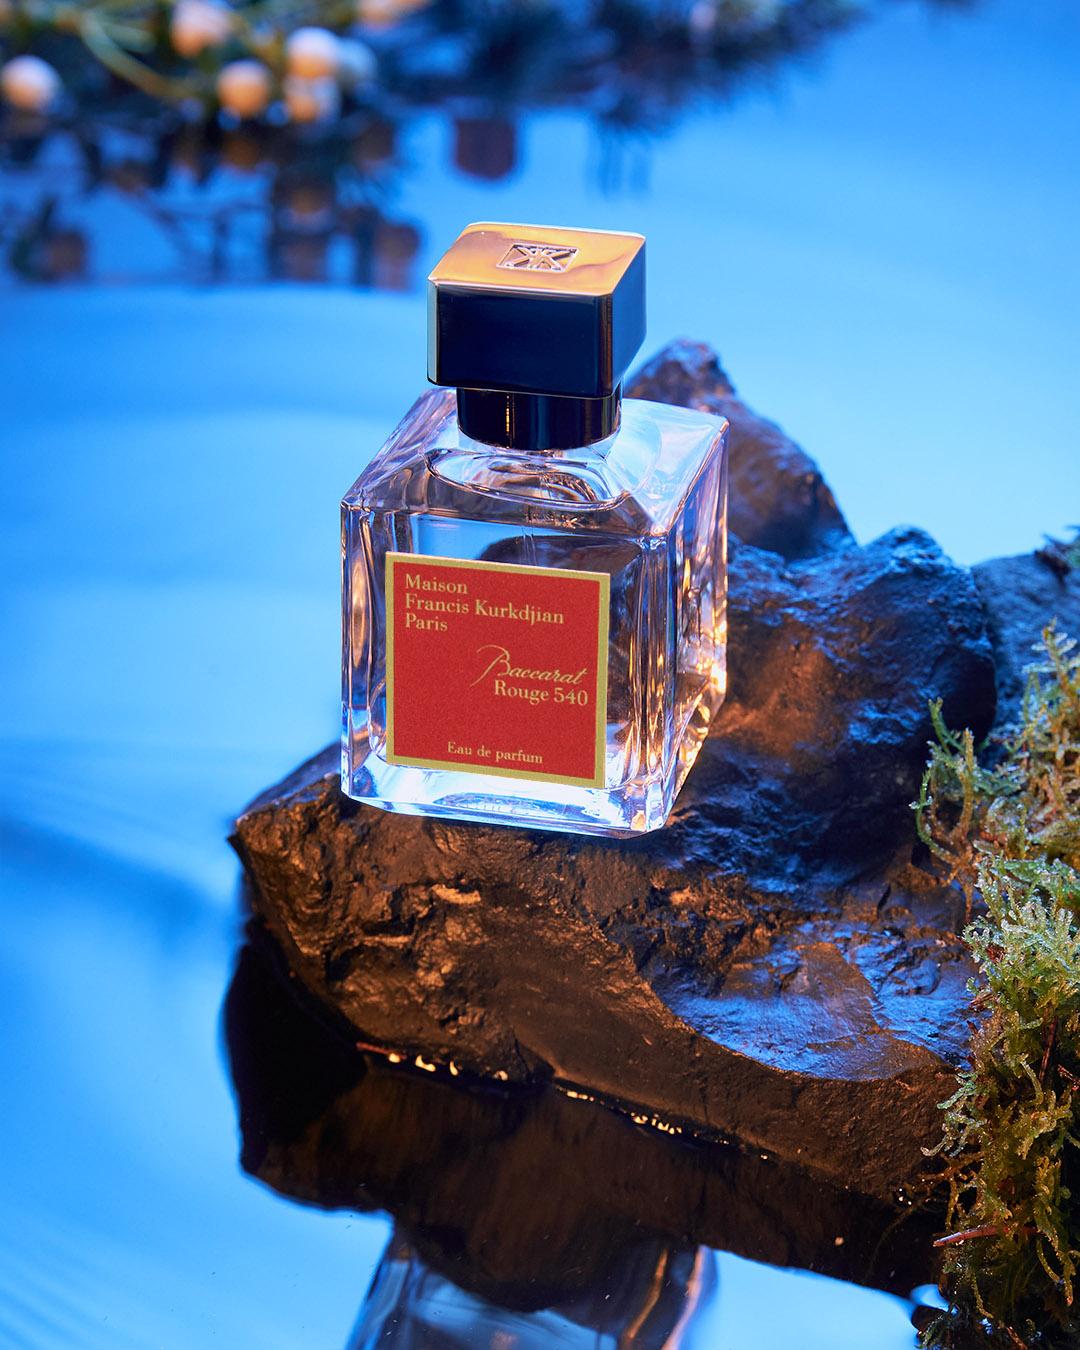 Kurkjian parfum